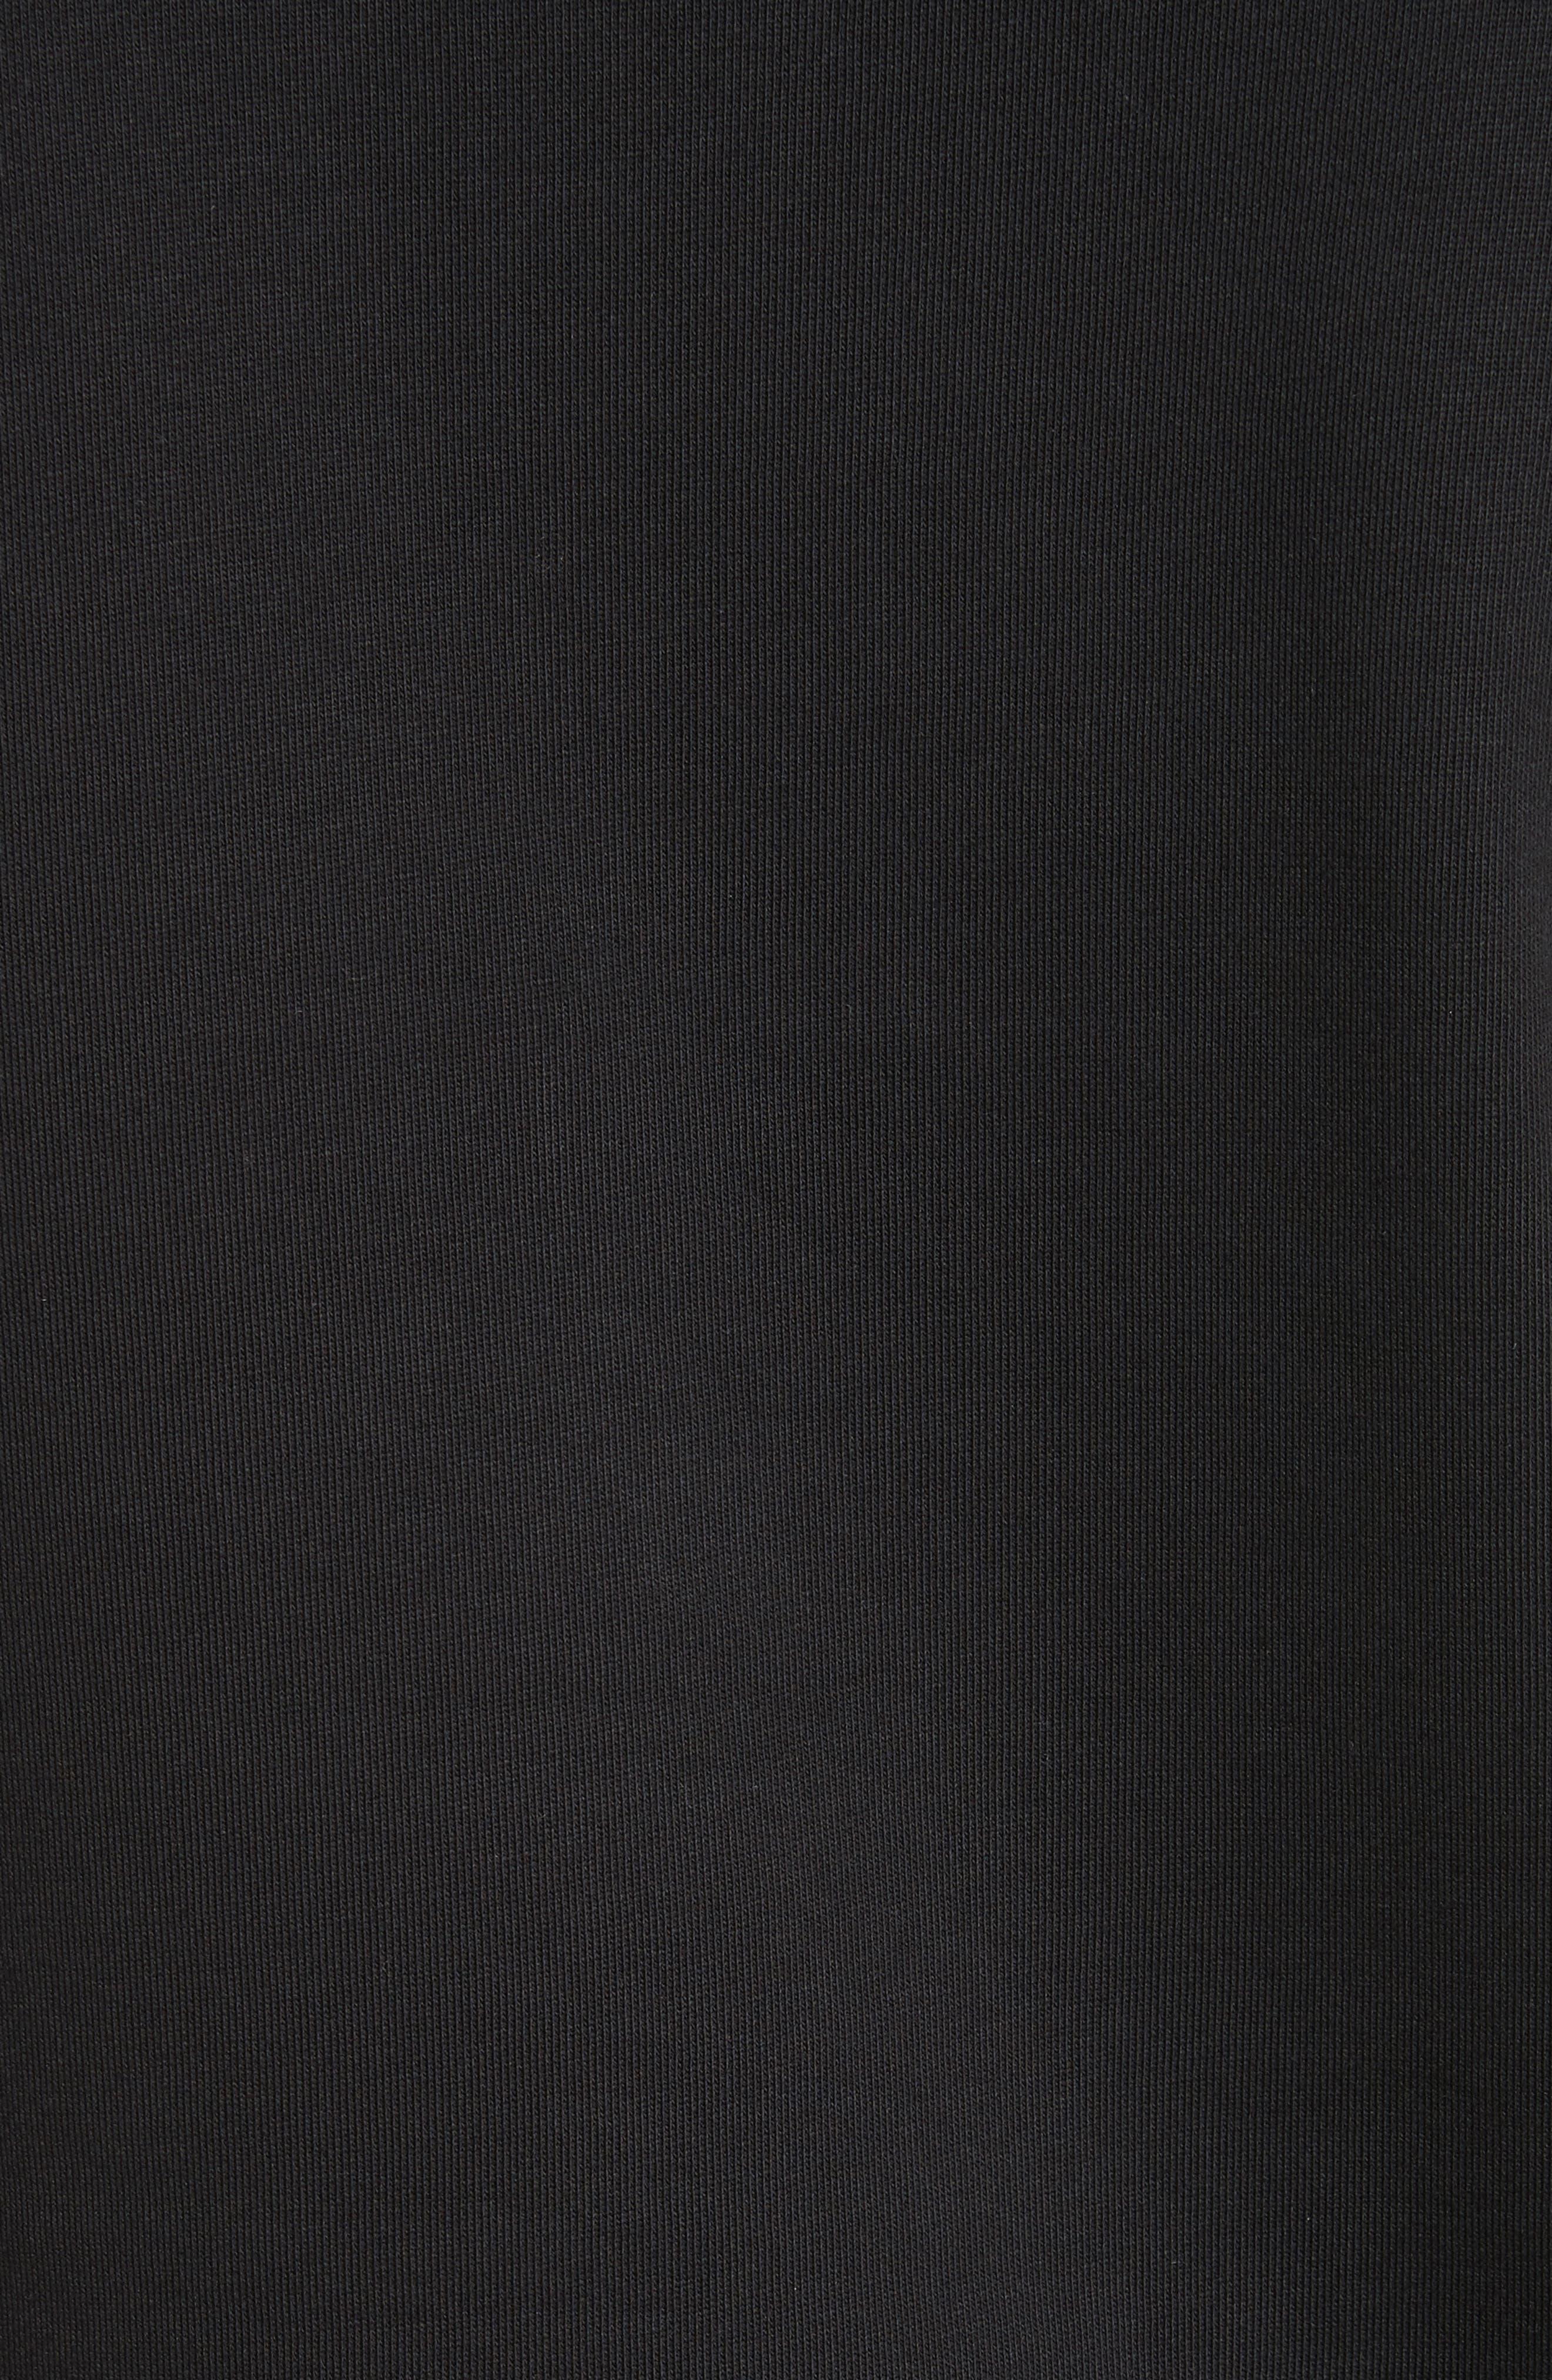 Maglia Crewneck Sweatshirt,                             Alternate thumbnail 5, color,                             Black